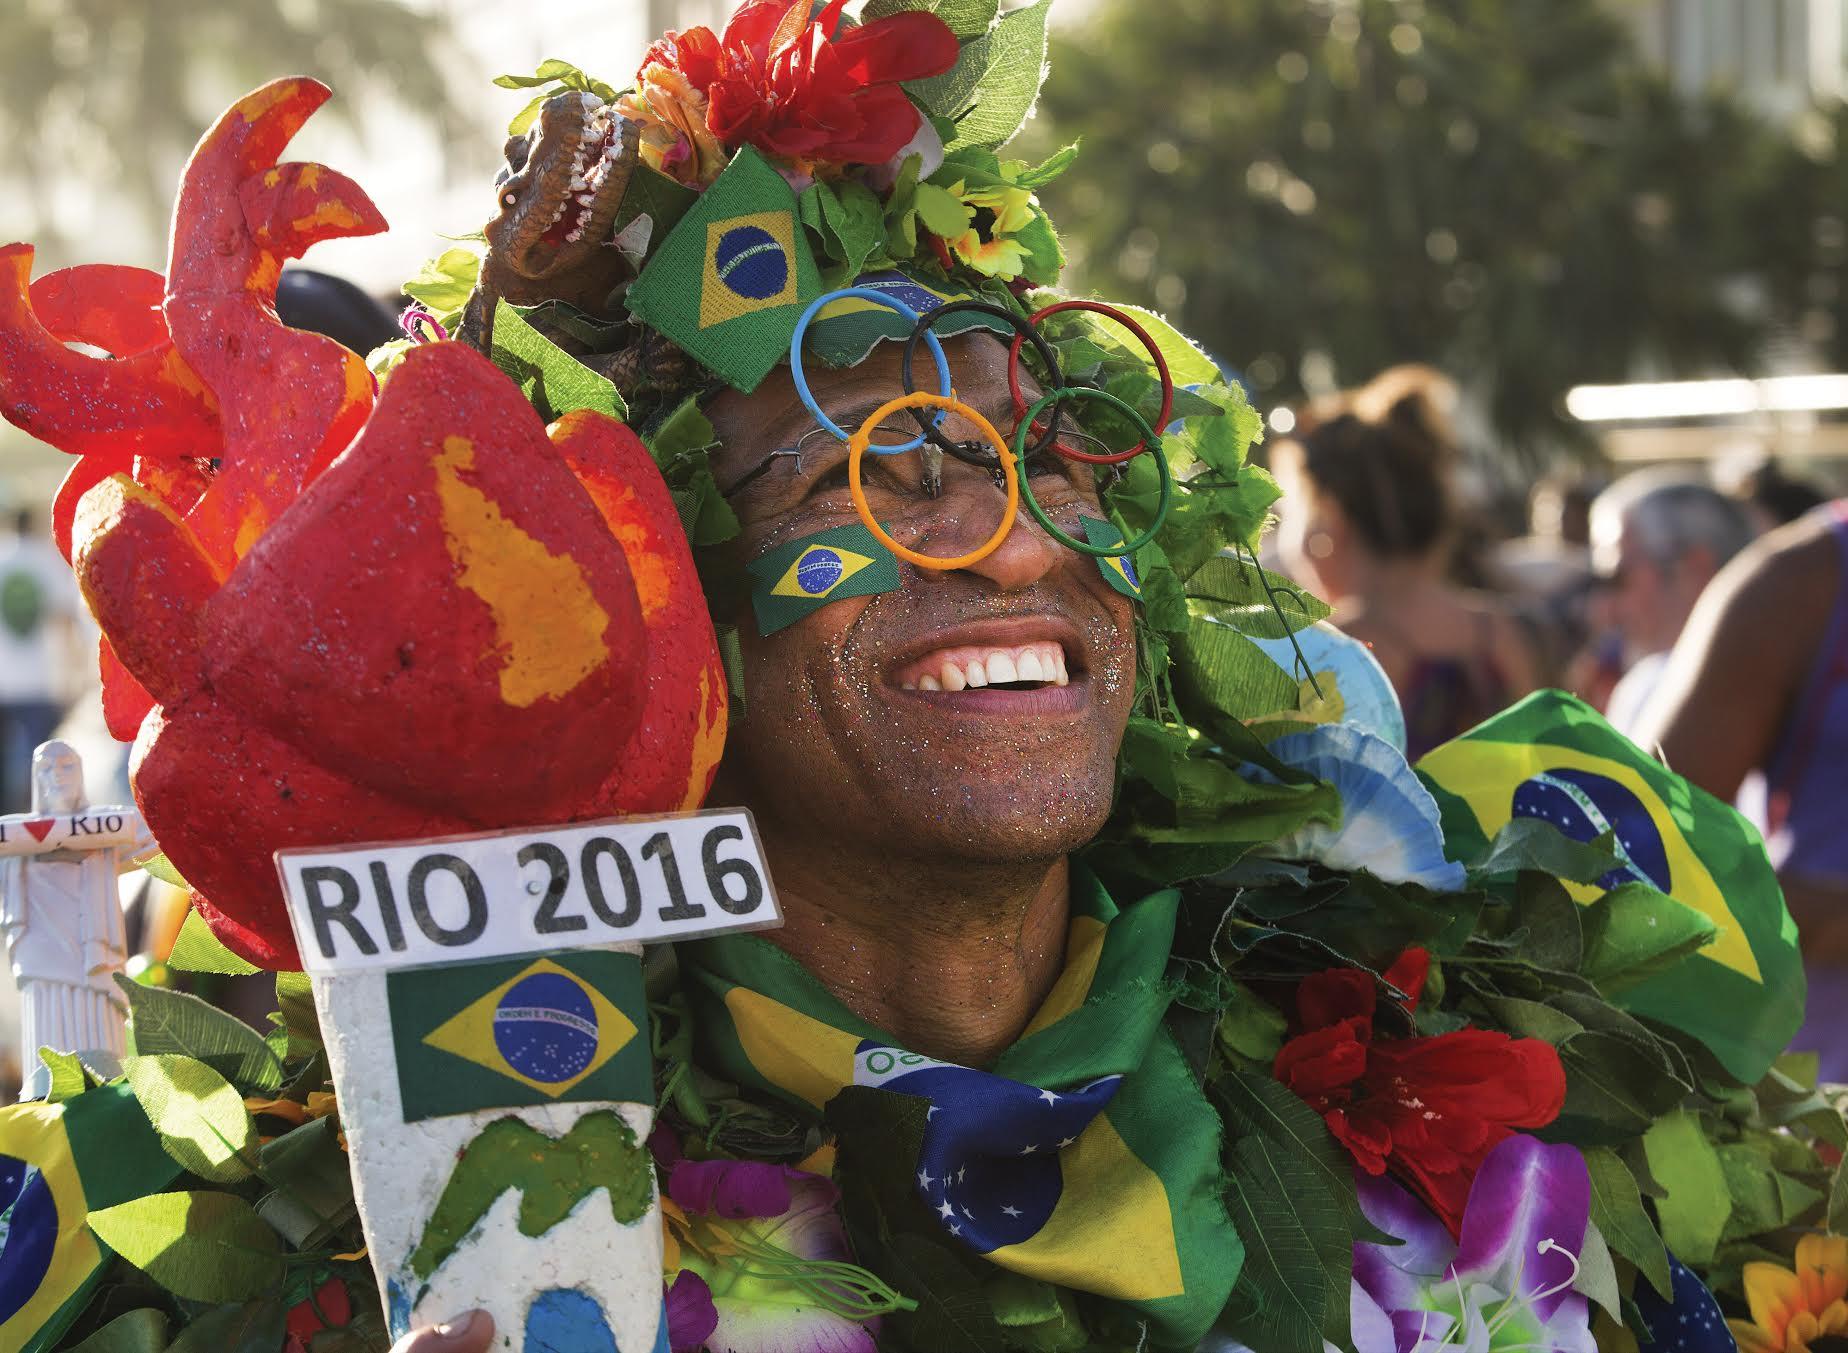 Olympics pic